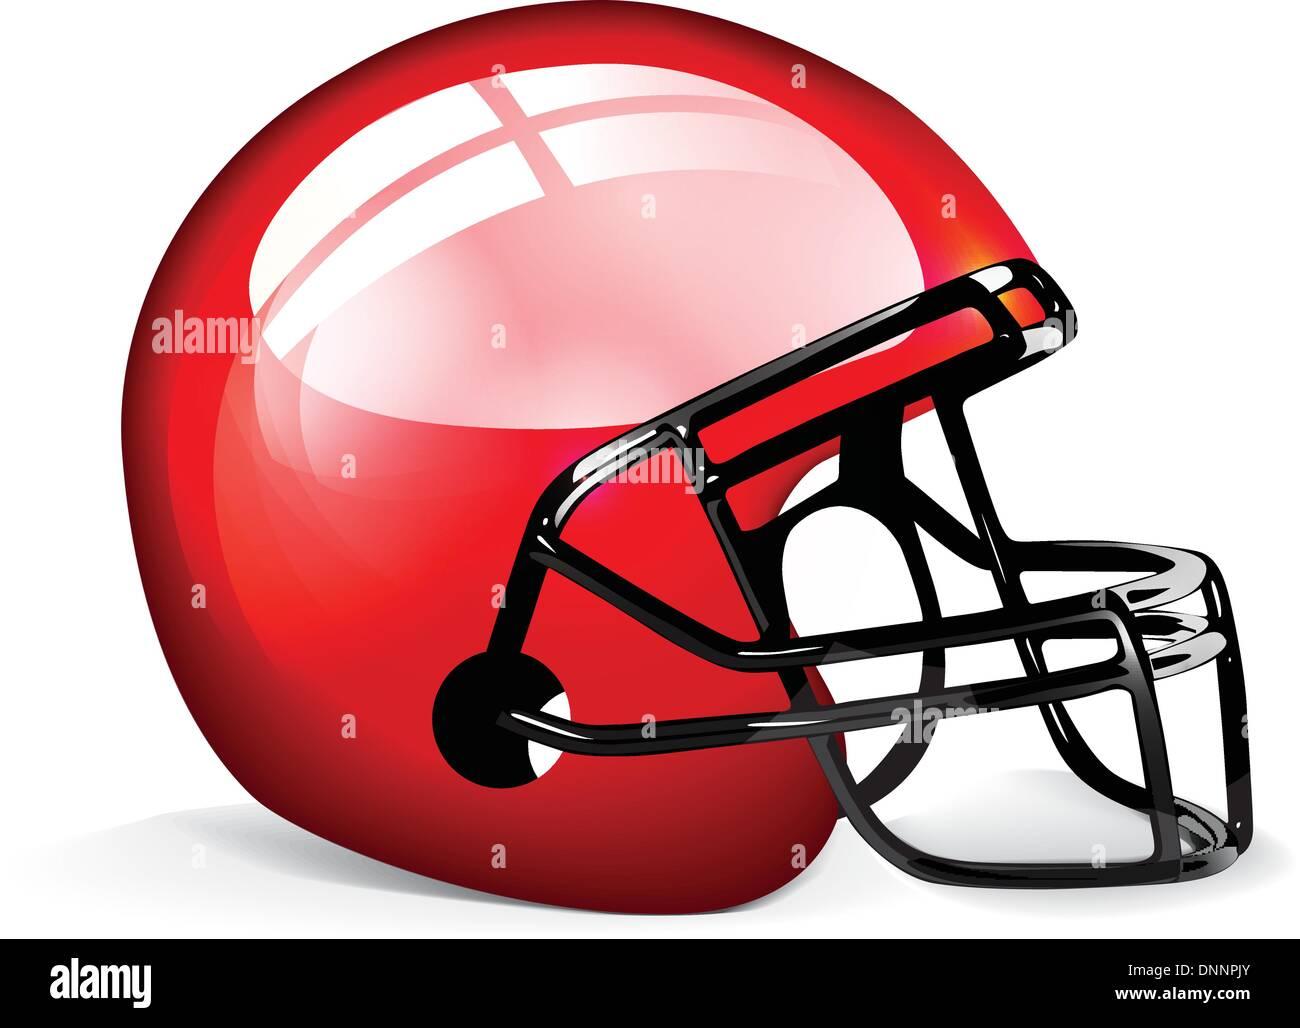 Casco de fútbol americano rojo aislado sobre fondo blanco. Imagen De Stock